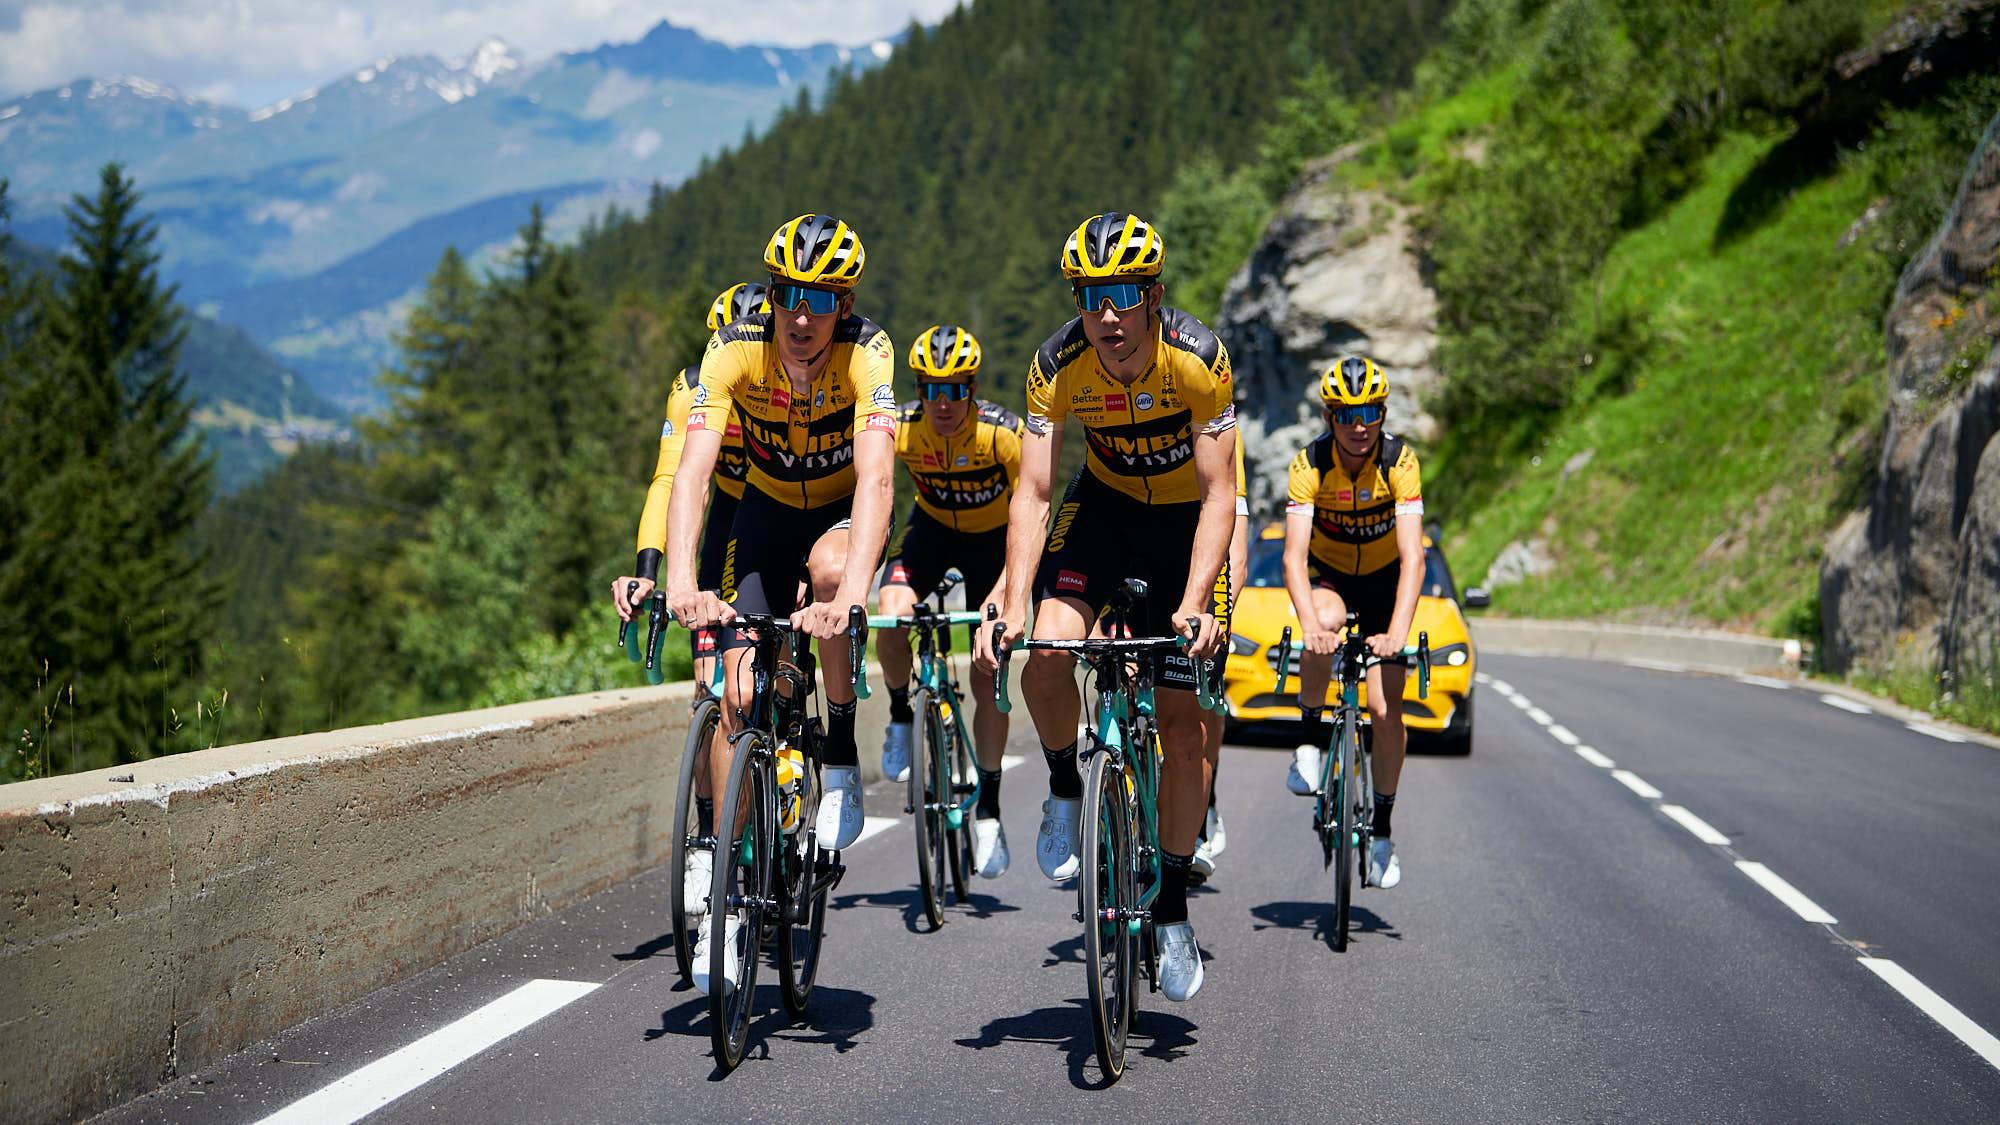 Team Jumbo-Visma's Tour de France selection